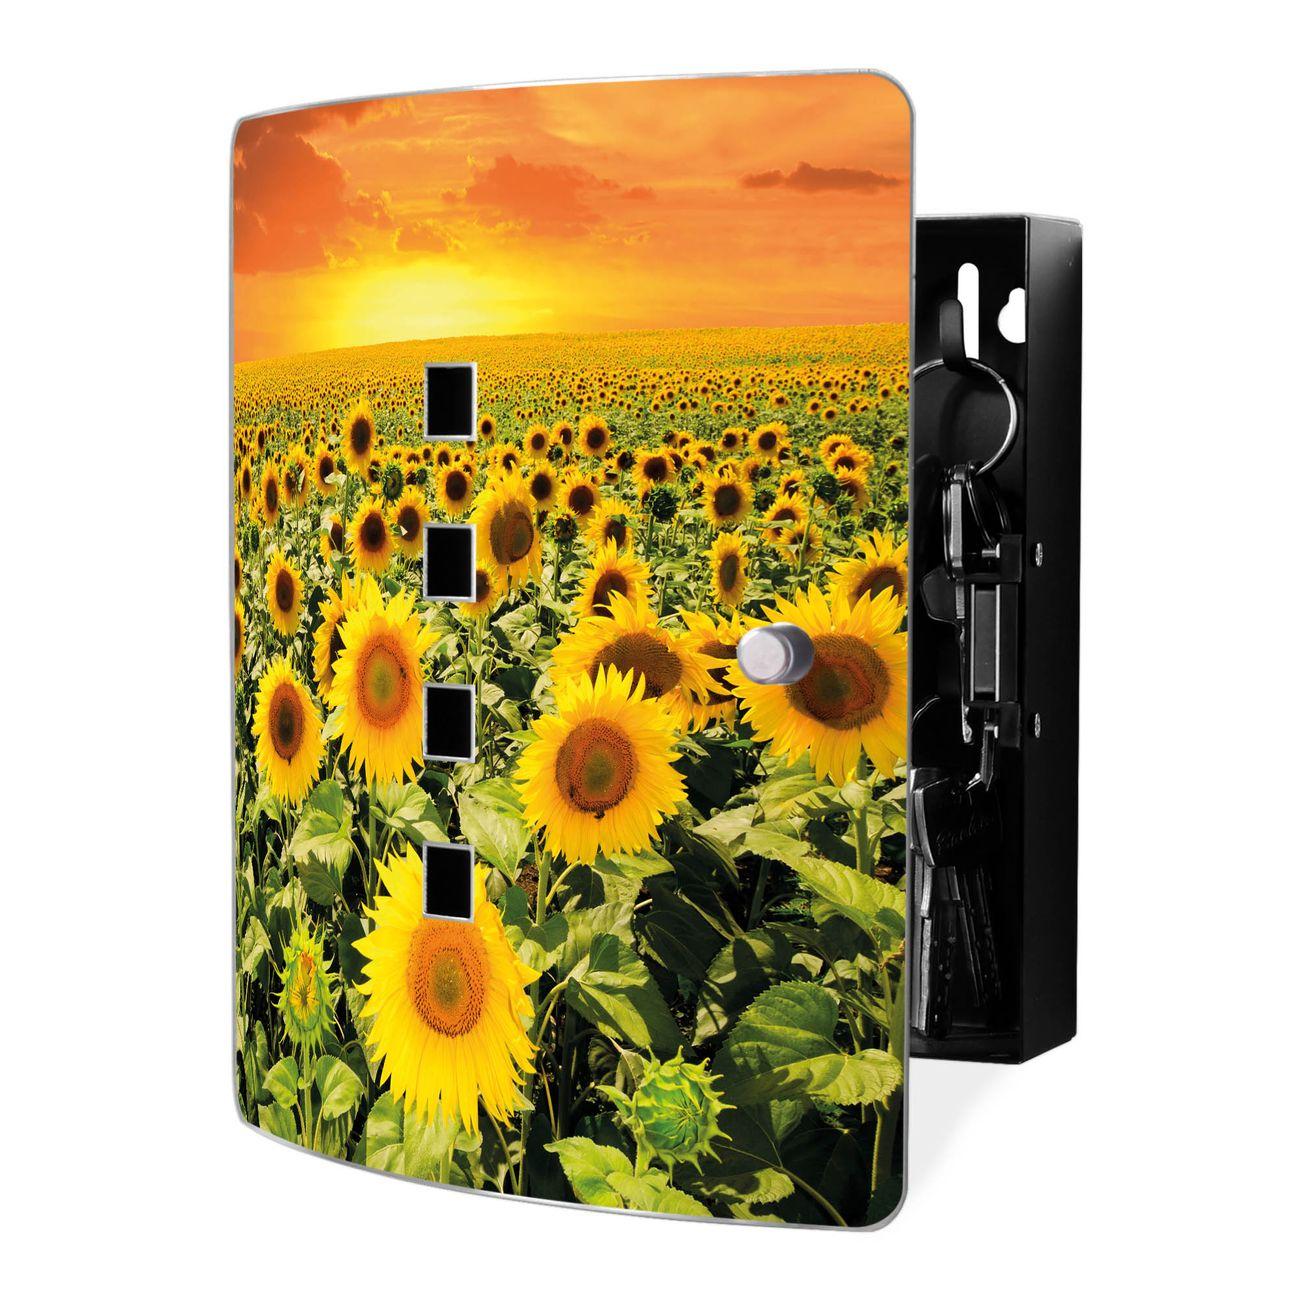 Schlüsselkasten Motiv Sonnenblumenmeer